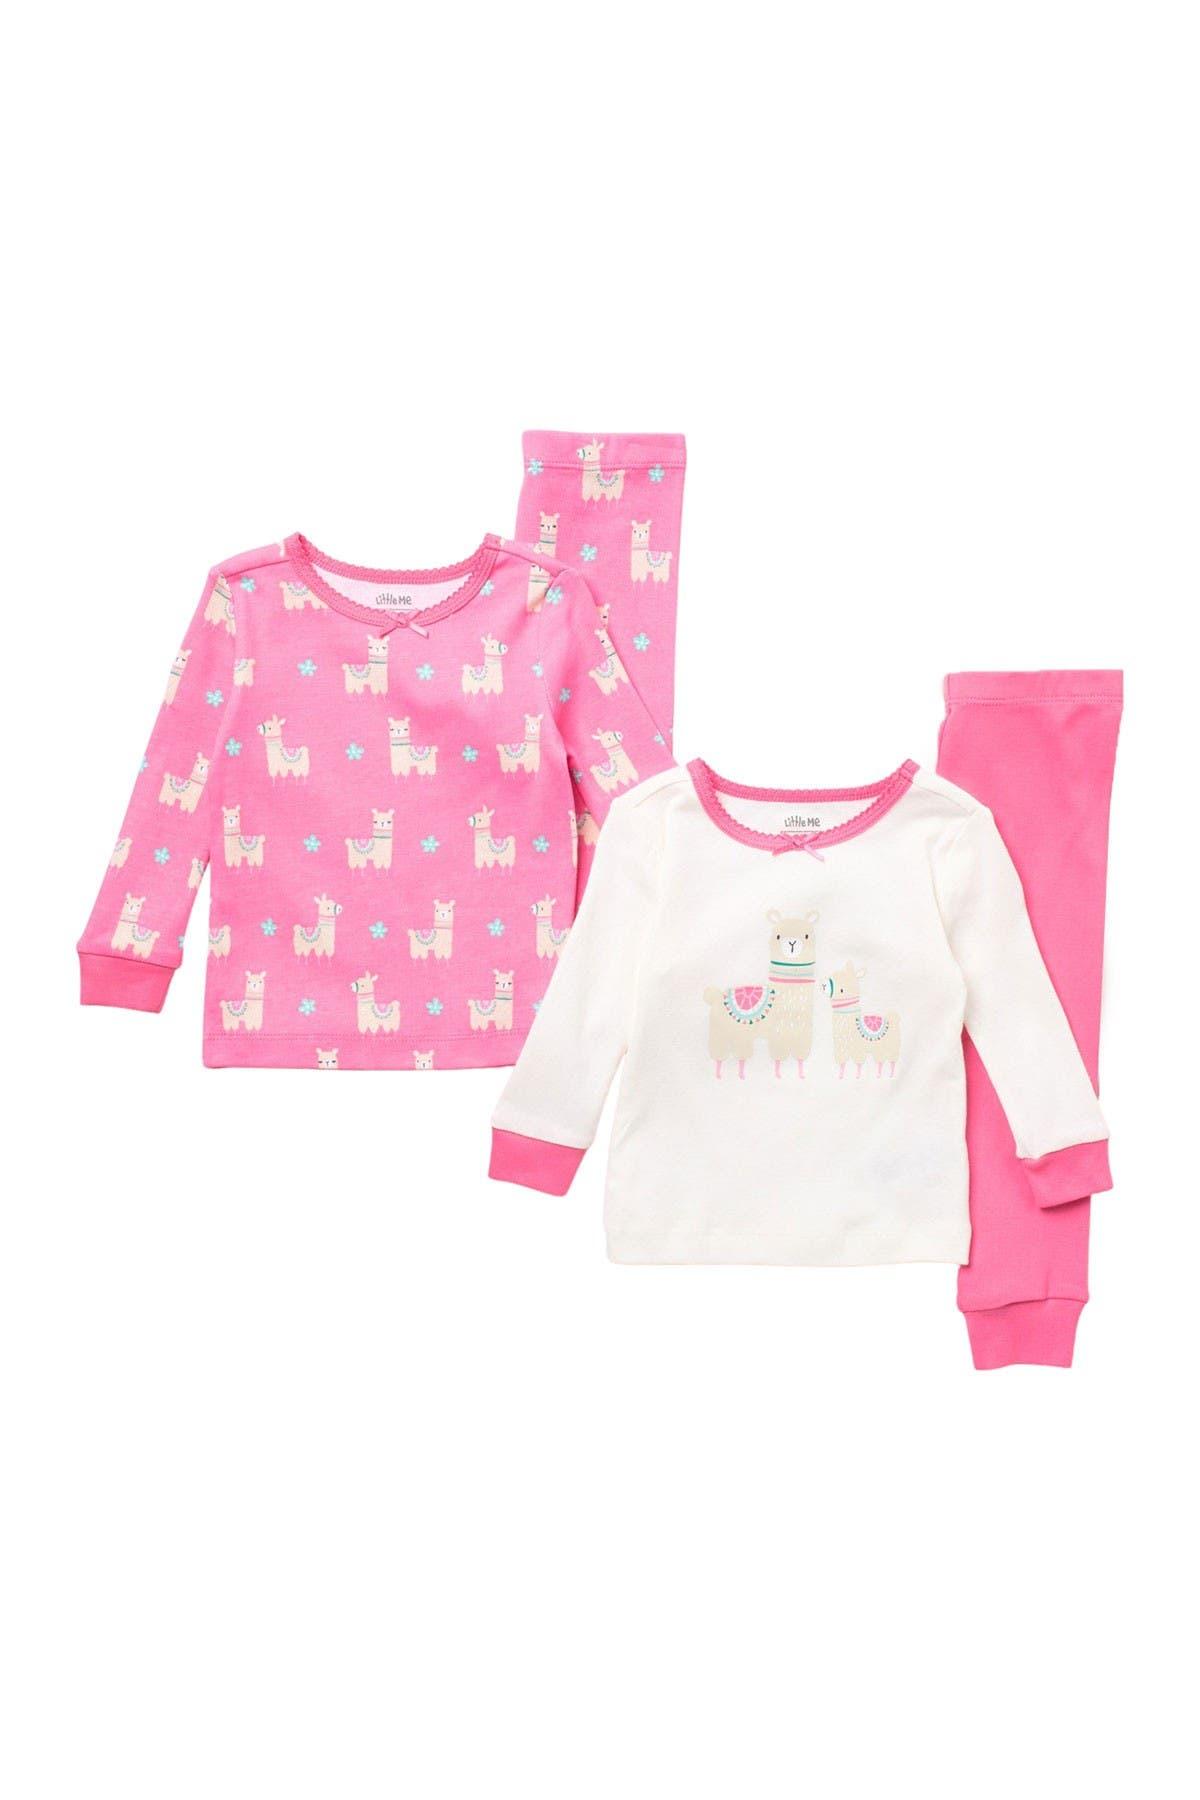 Image of Little Me Llama Print Pajama Set - Set of 2